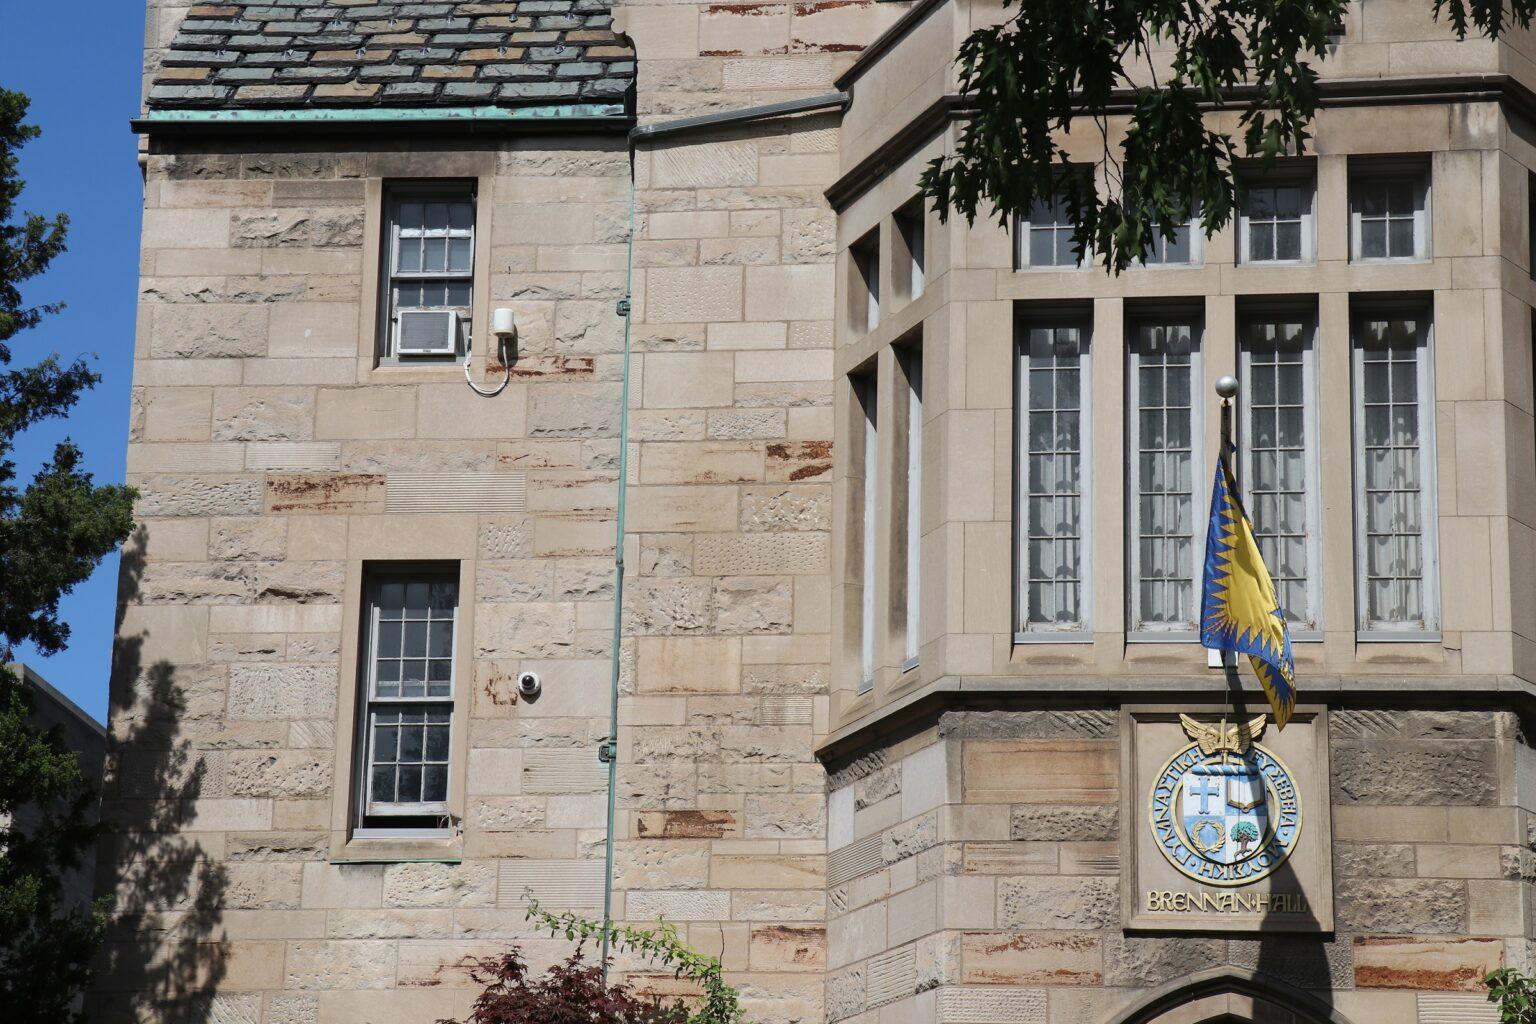 The south facade of Brennan Hall